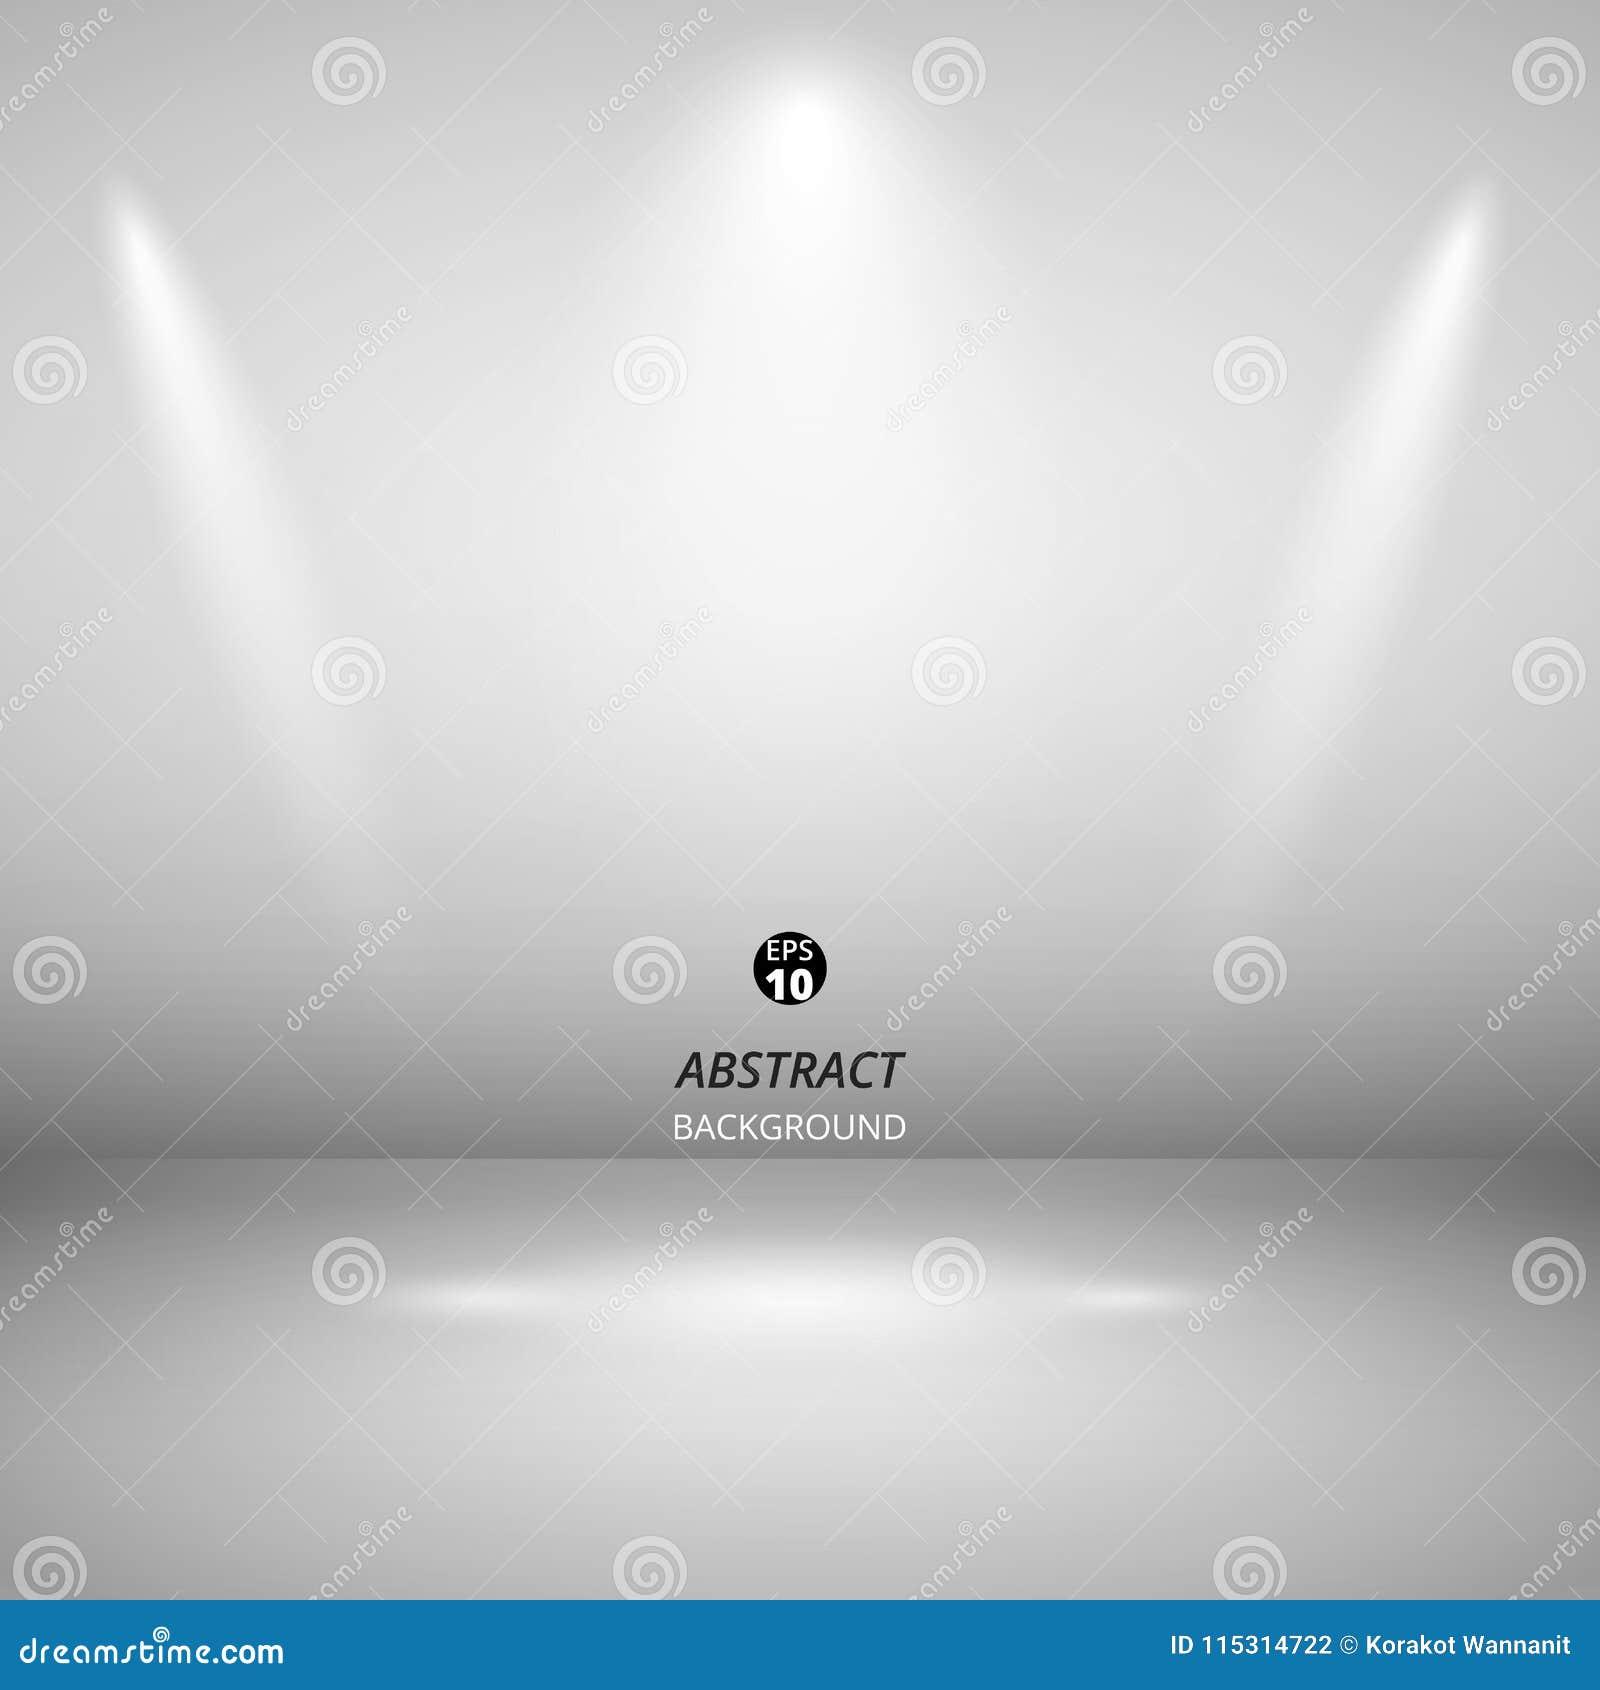 Abstract of spotlight presentation on black background.